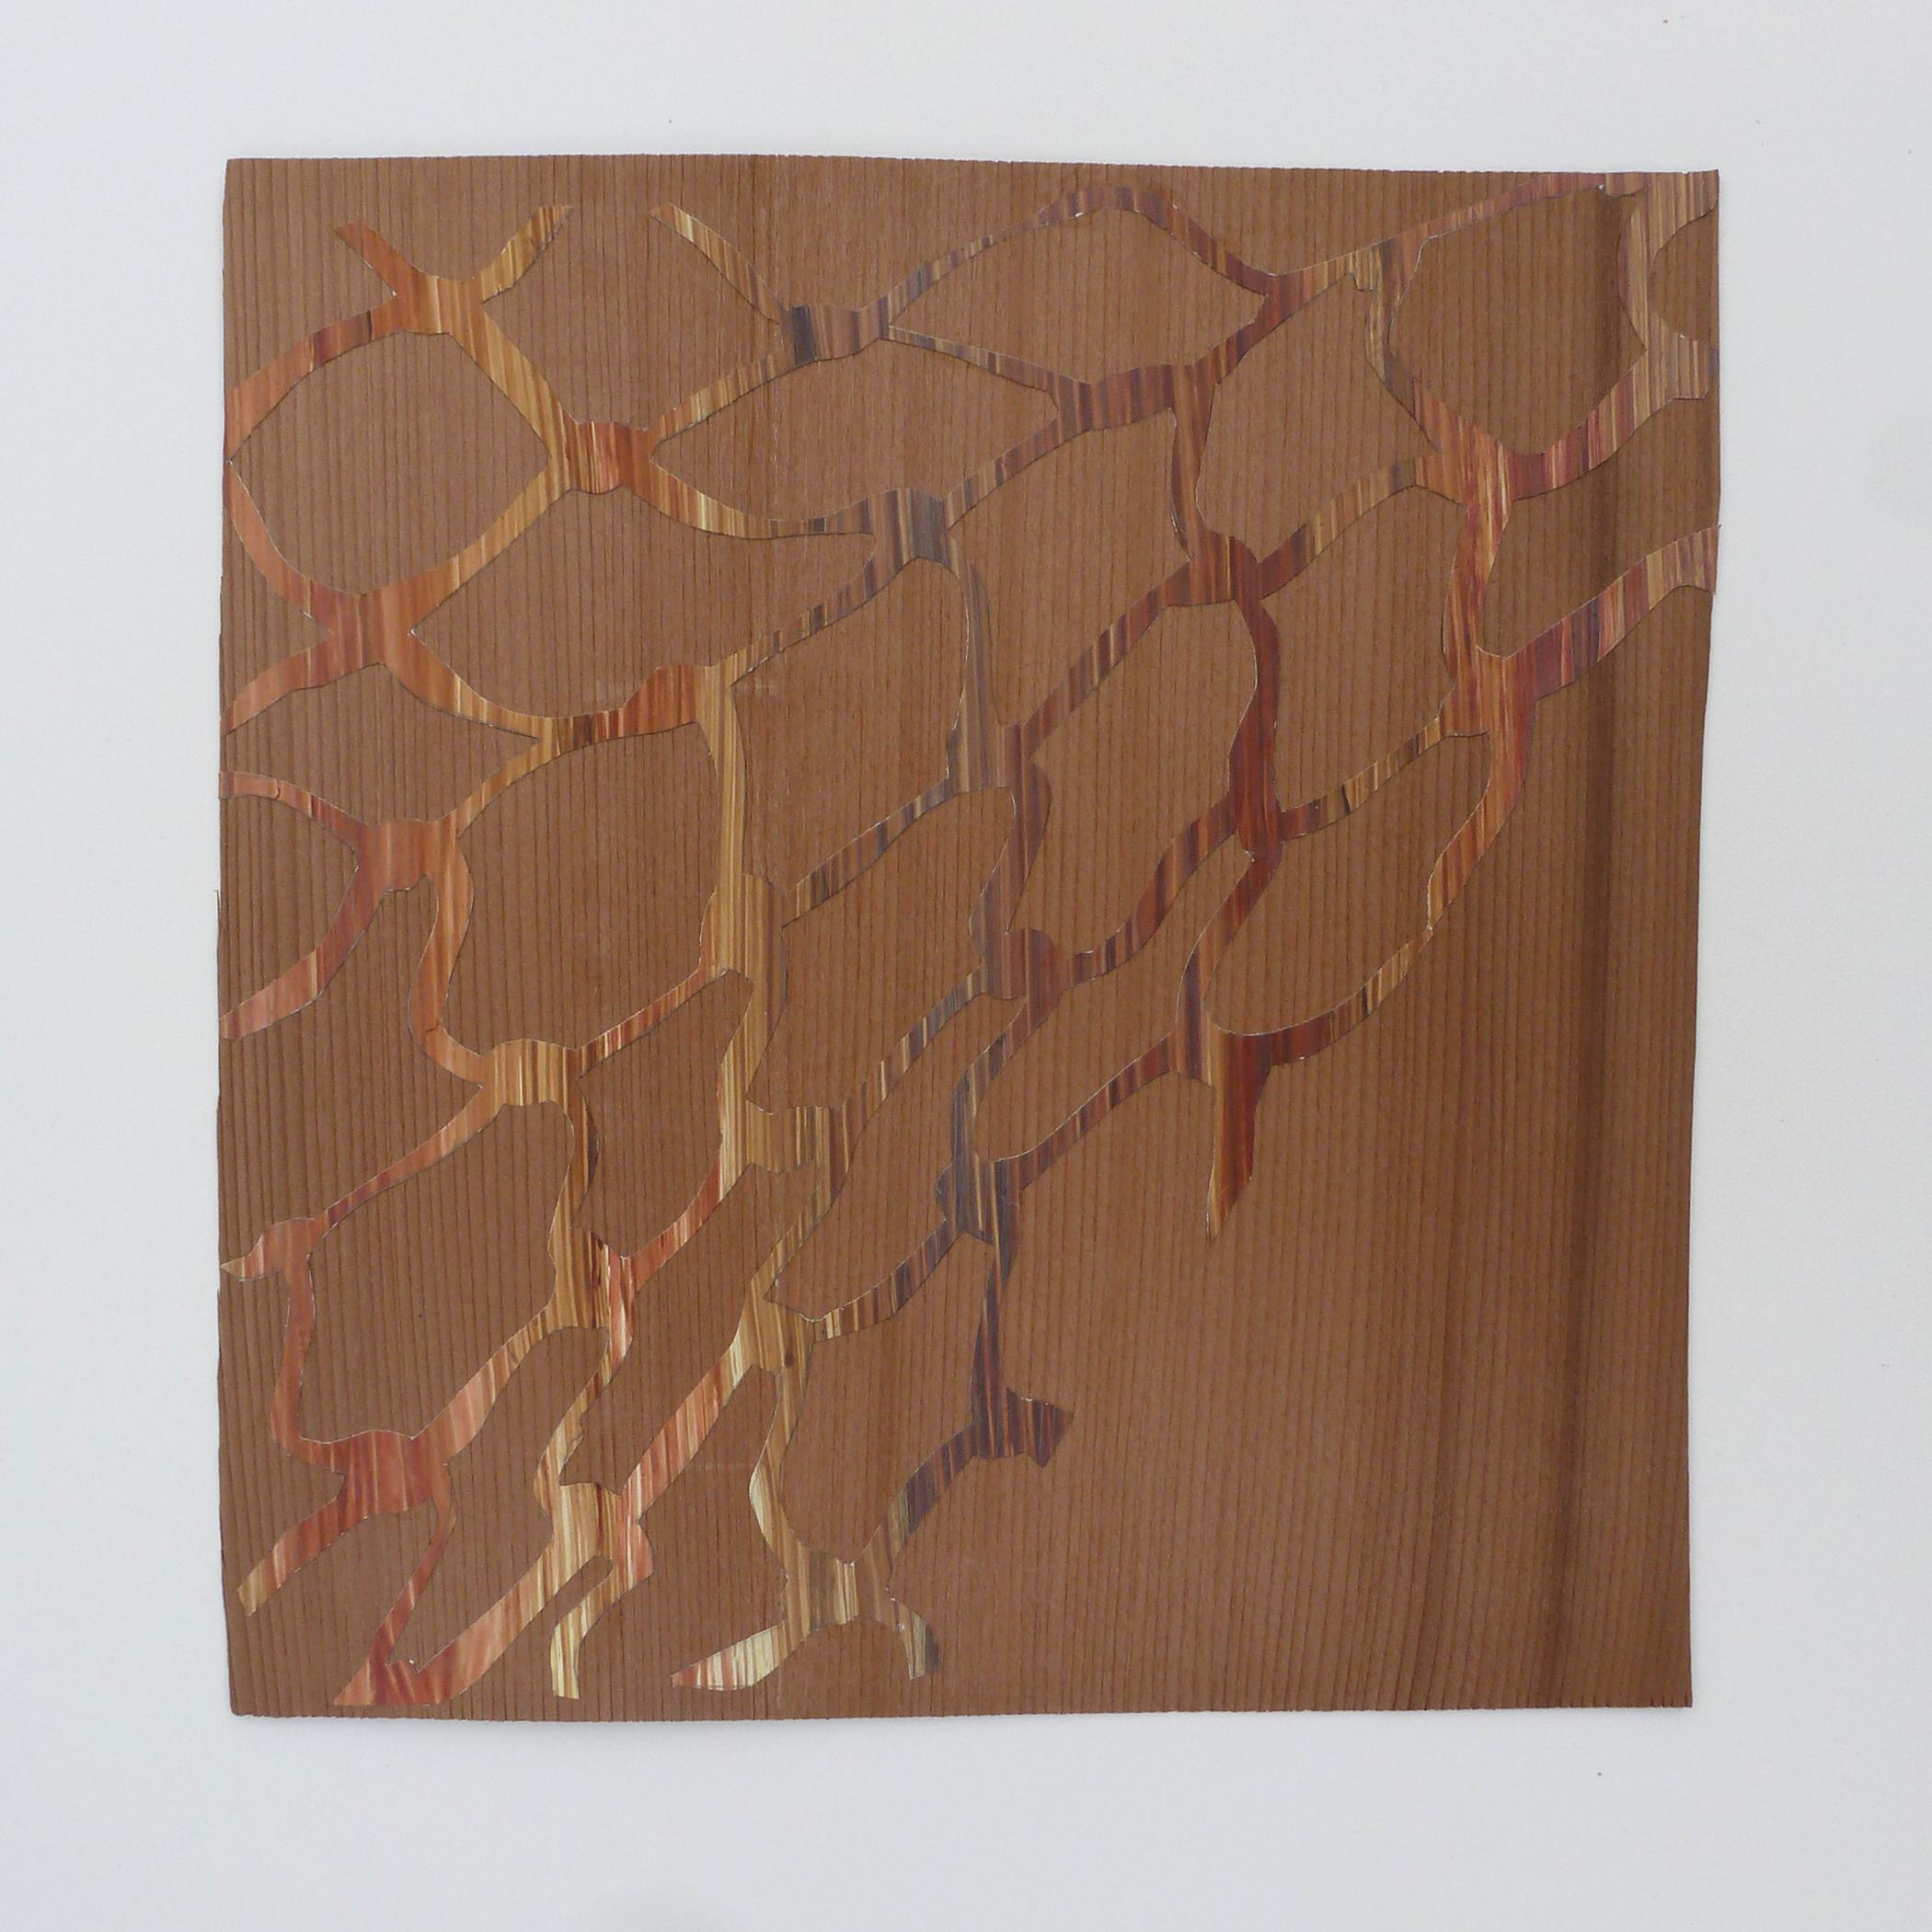 "Wood on Wood, 2014, hand-cut acrylic on paper, mahogany veneer, H 8"" x W 8"""